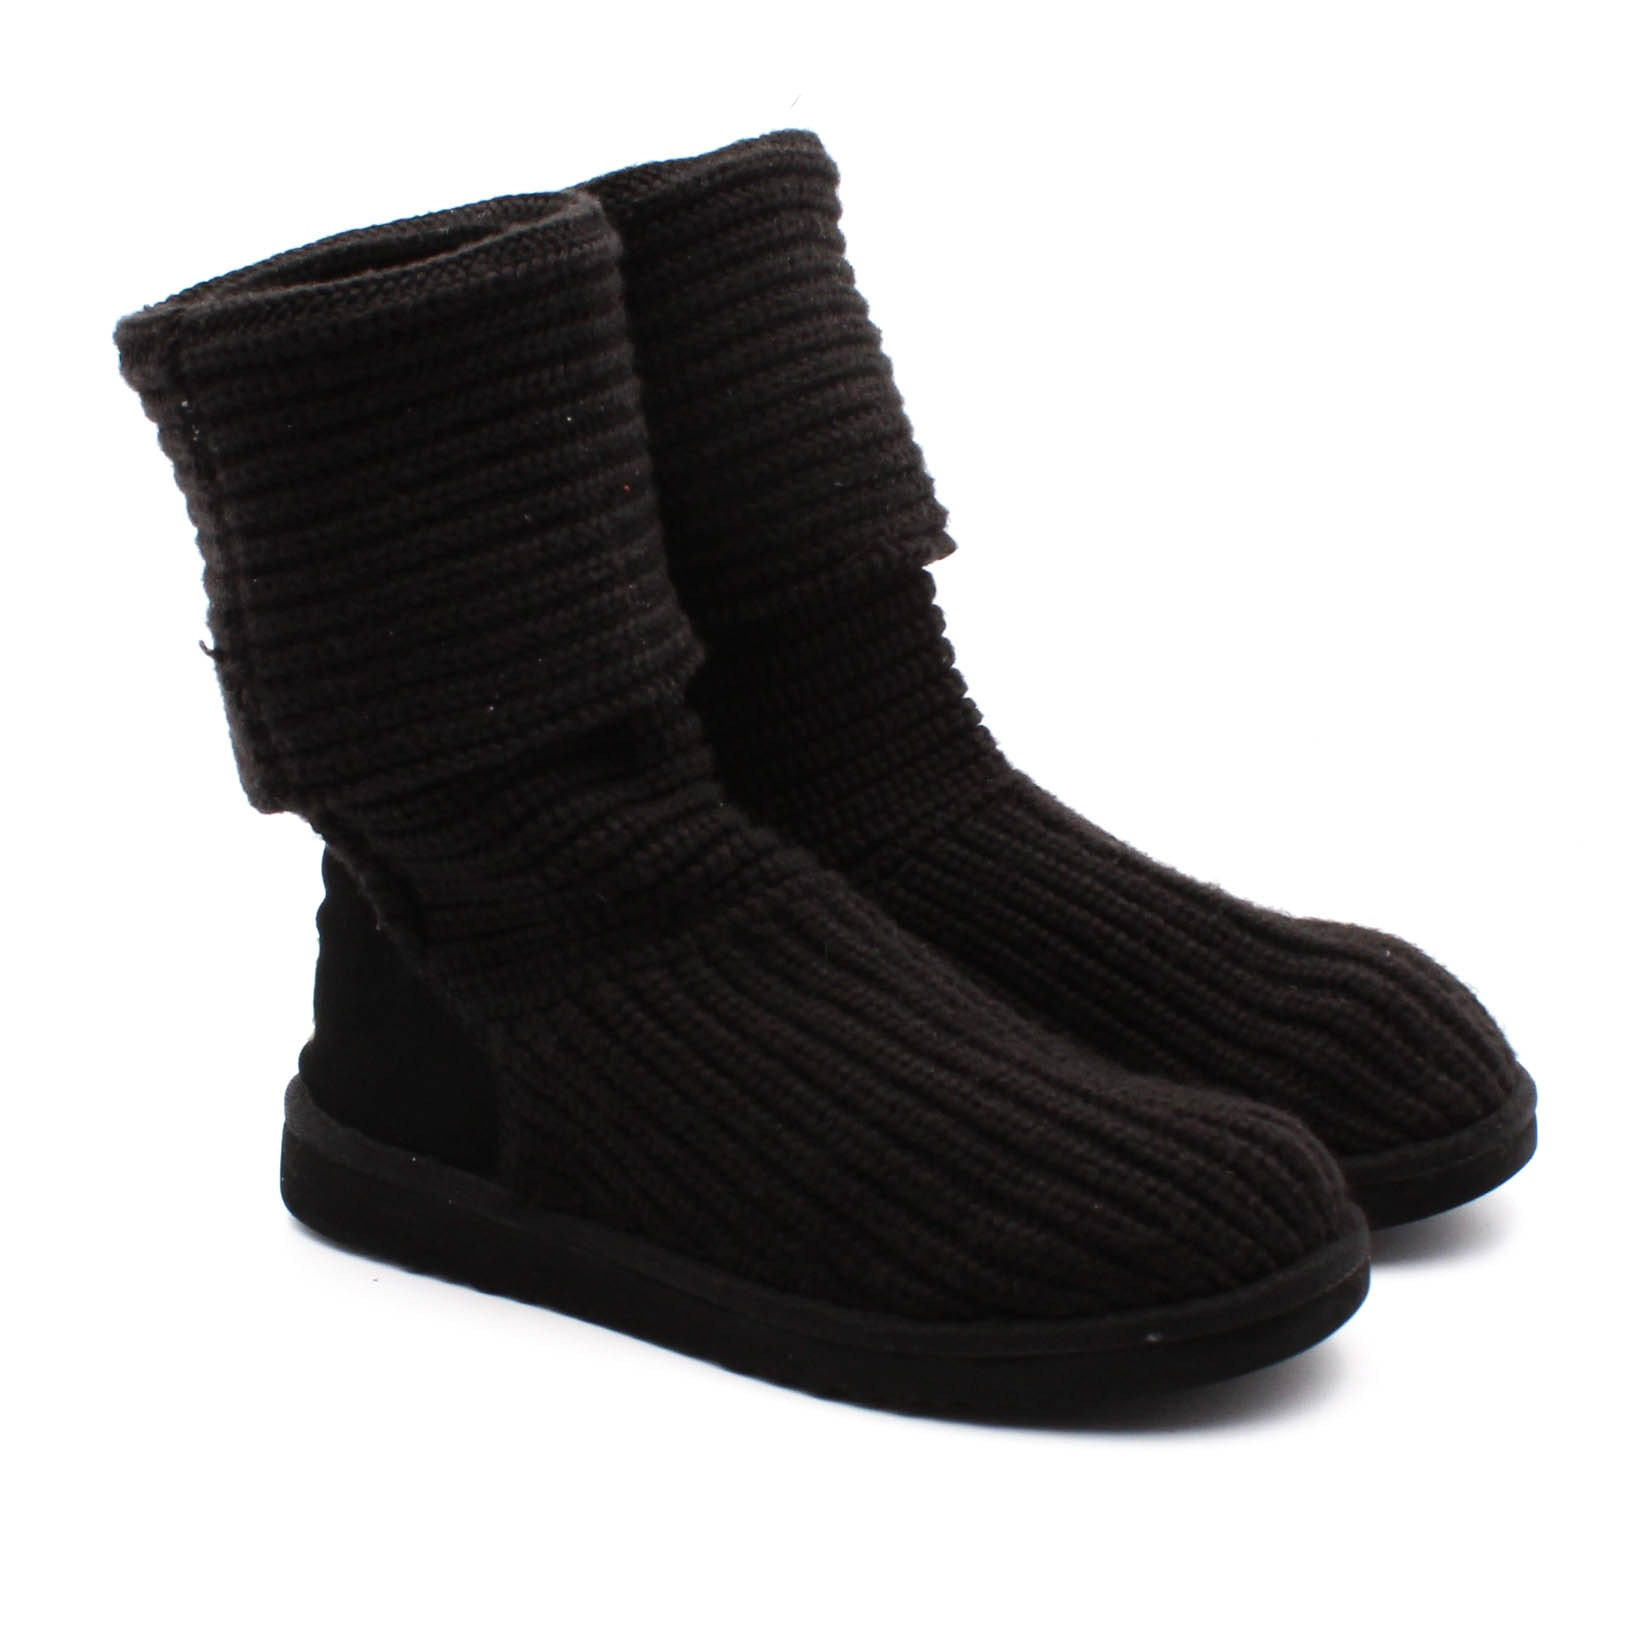 Women's UGG Australia Cardy Black Knit Boots